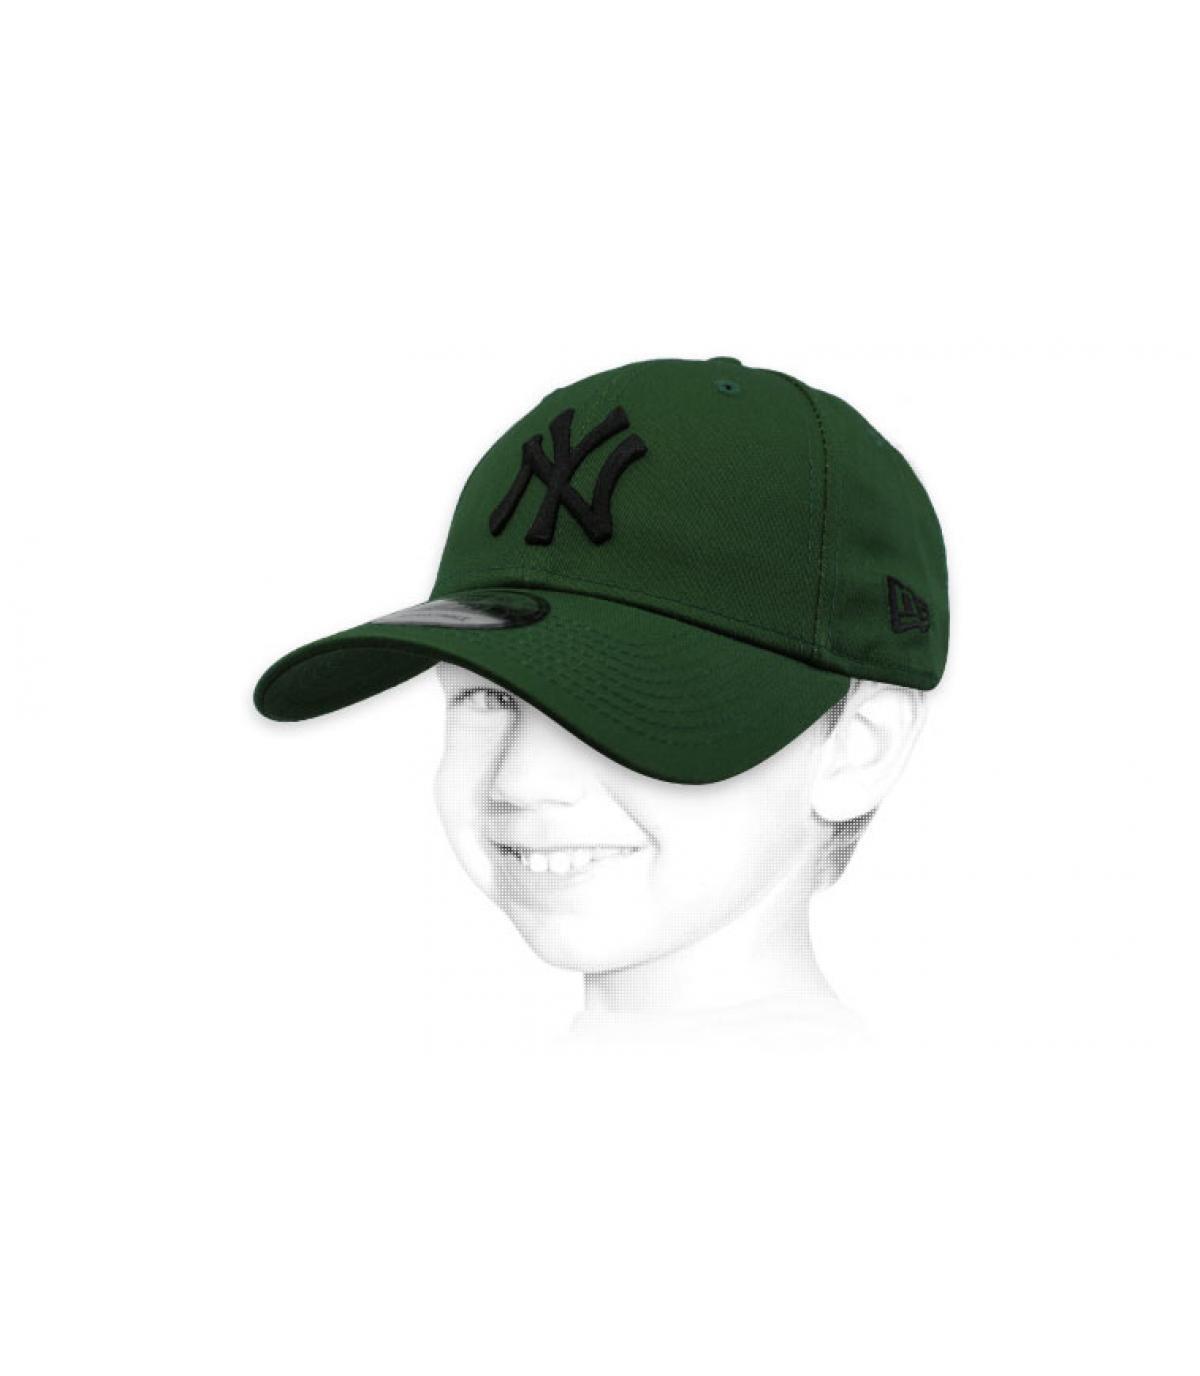 berretto bambino NY verde